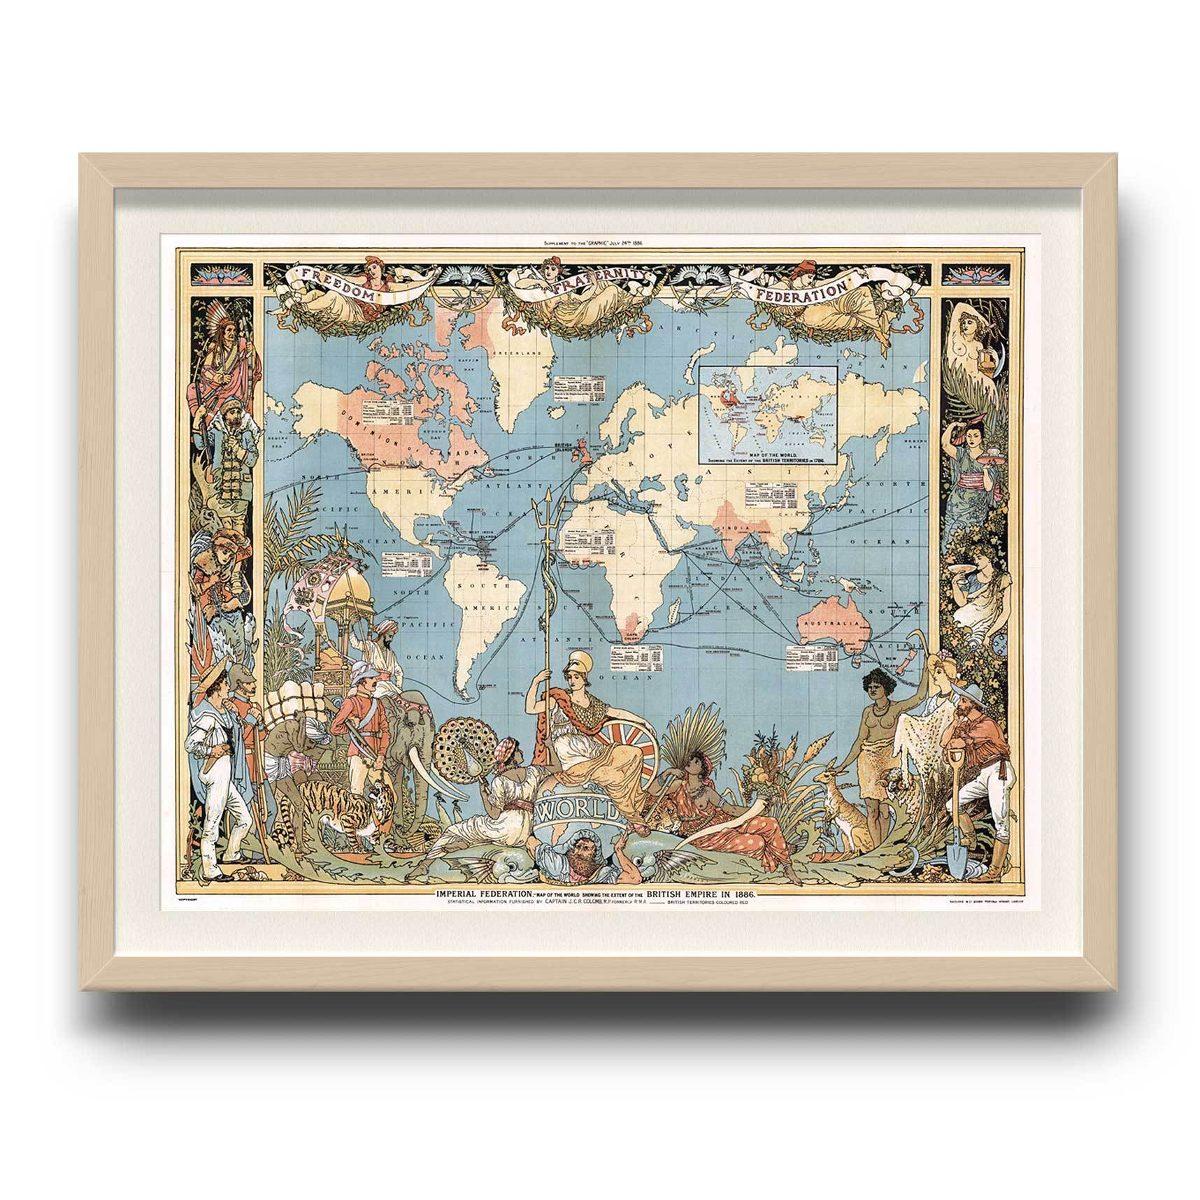 Cuadro Mapa Mundi De 1886 - Enmarcado Mappin - $ 70.000 en Mercado Libre